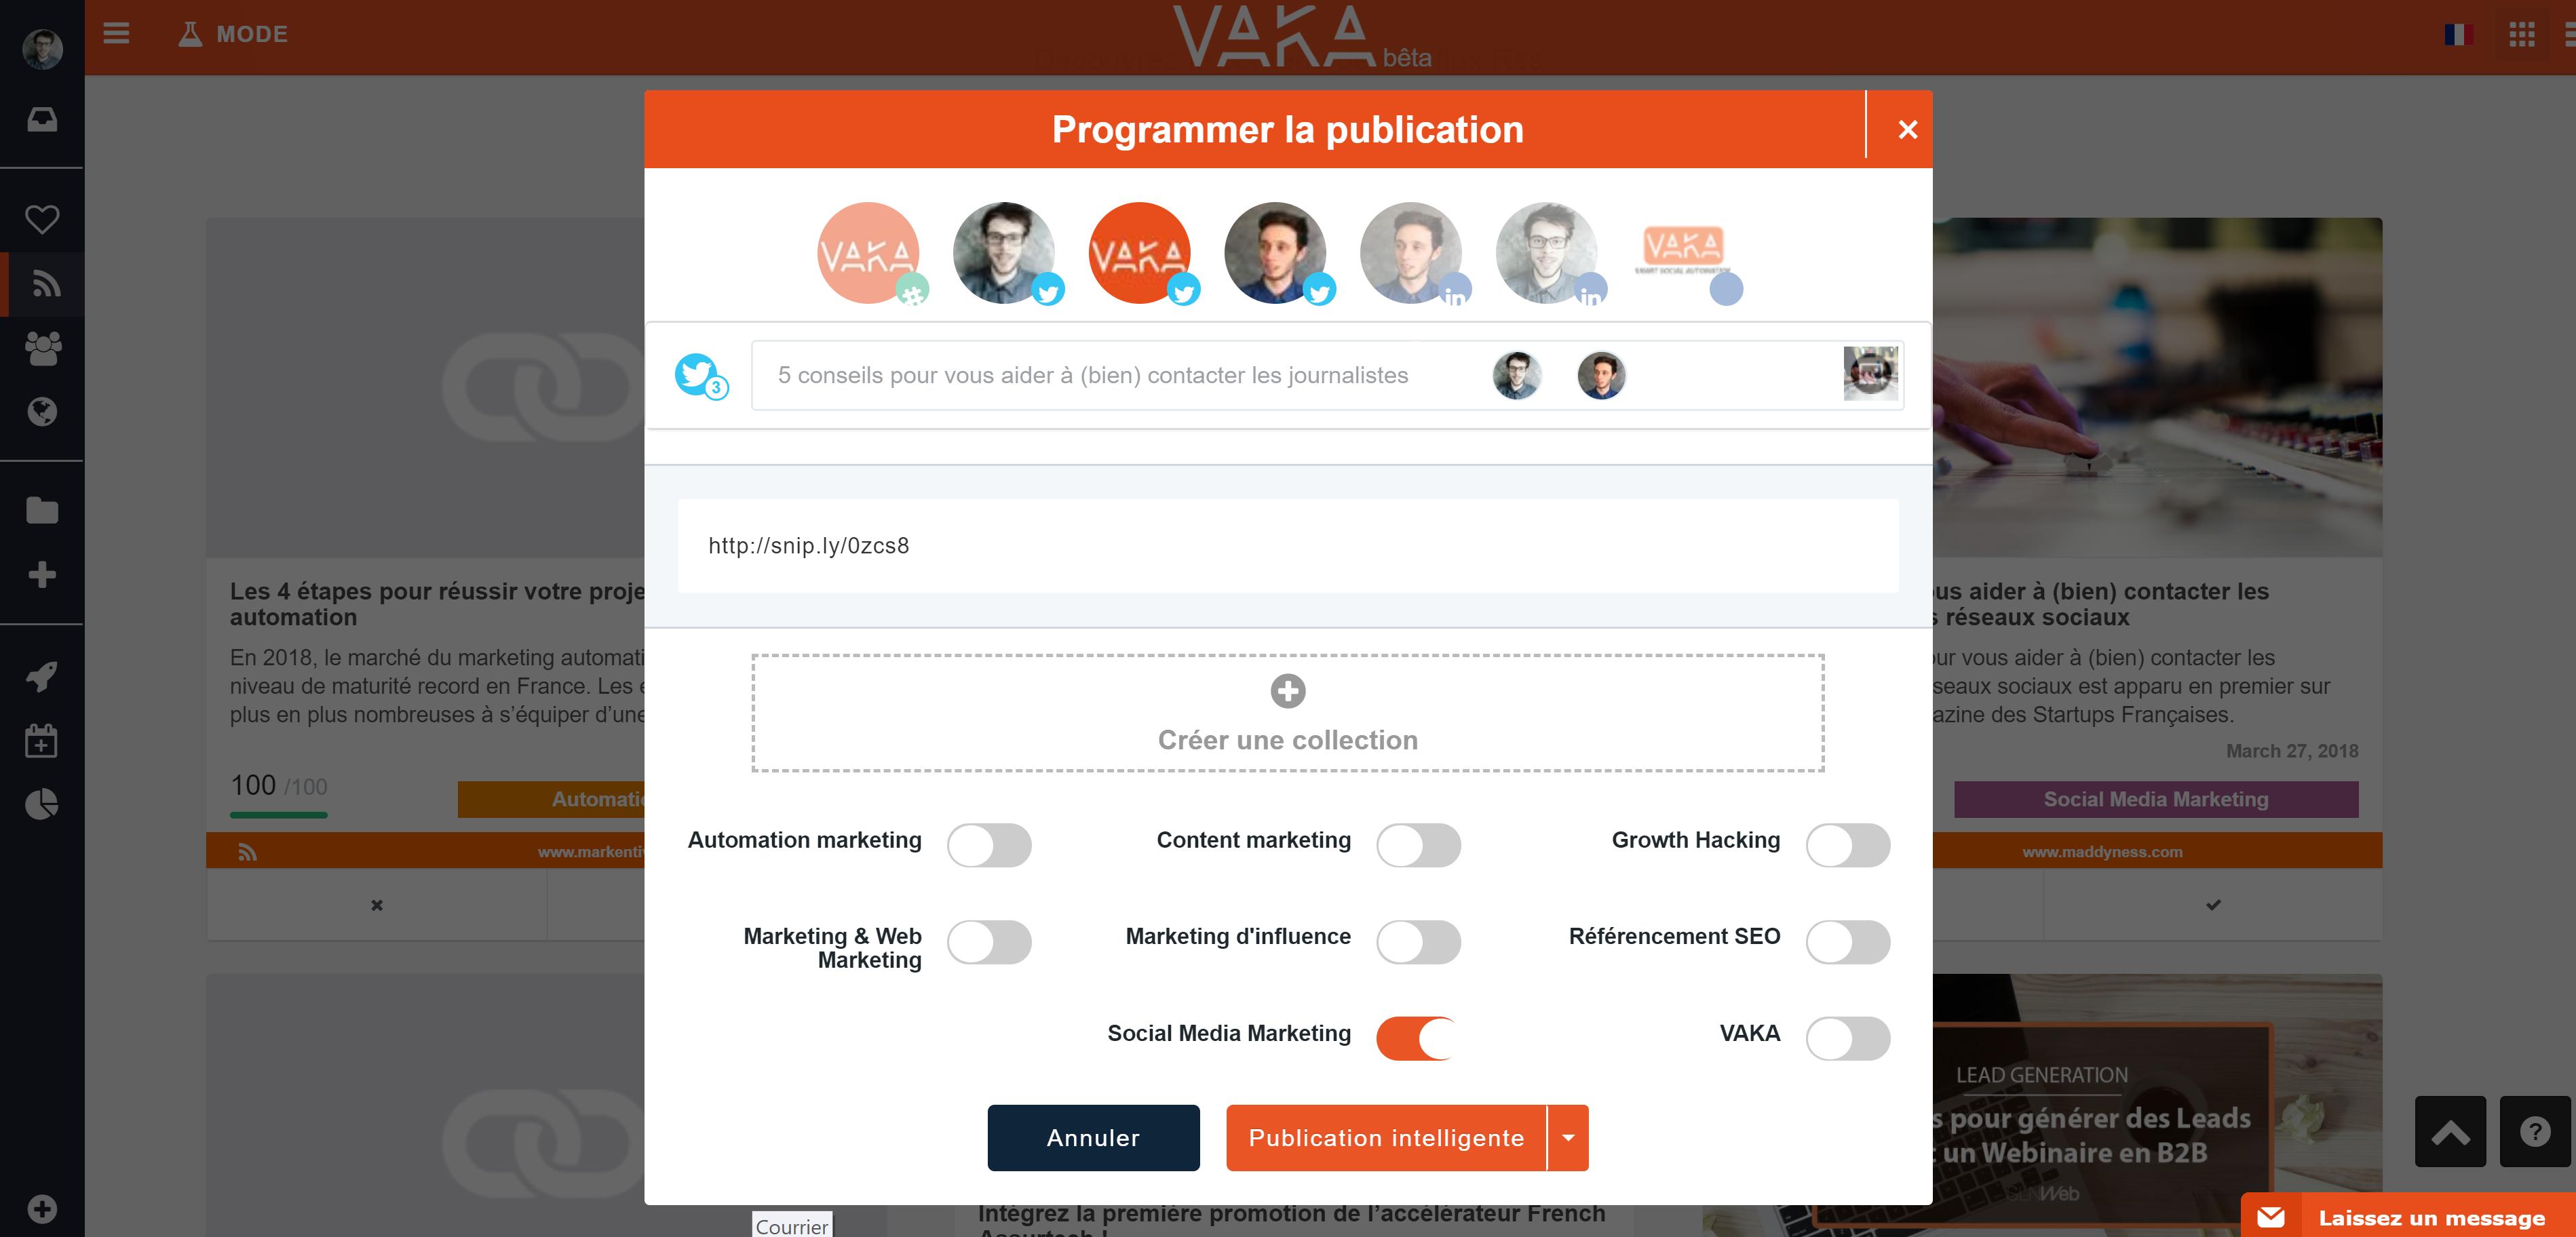 vaka-twitter-api - Selection des comptes twiters